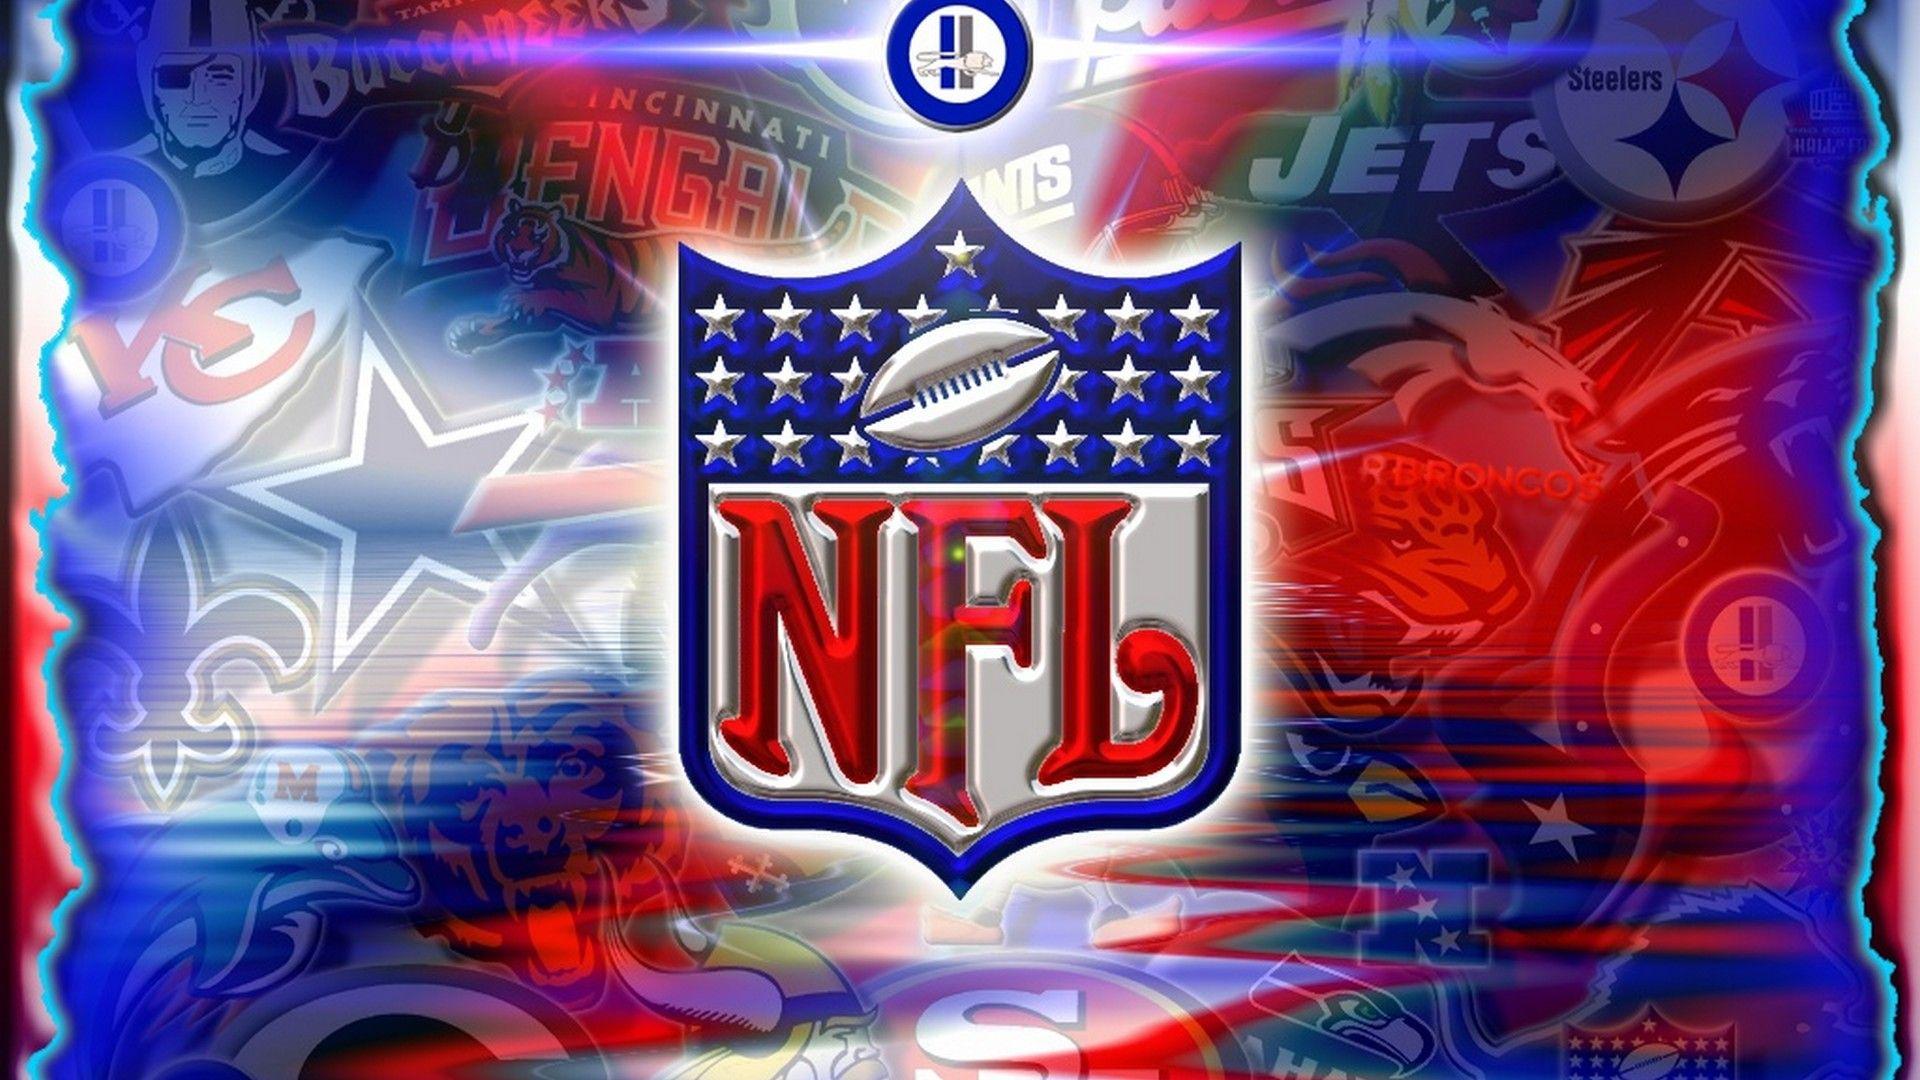 Nfl Wallpapers Nfl Preseason Nfl Football Wallpaper Nfl